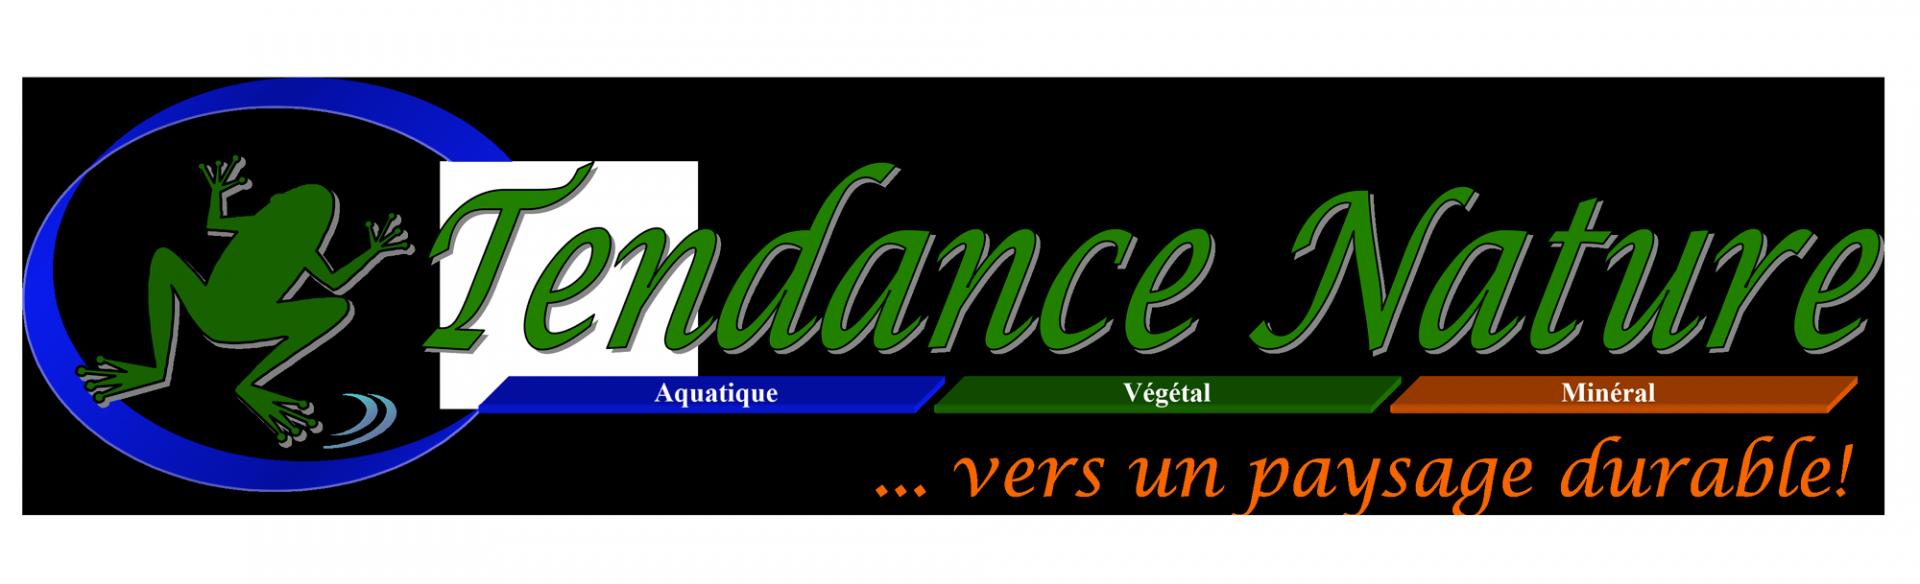 Logo Tendance Nature